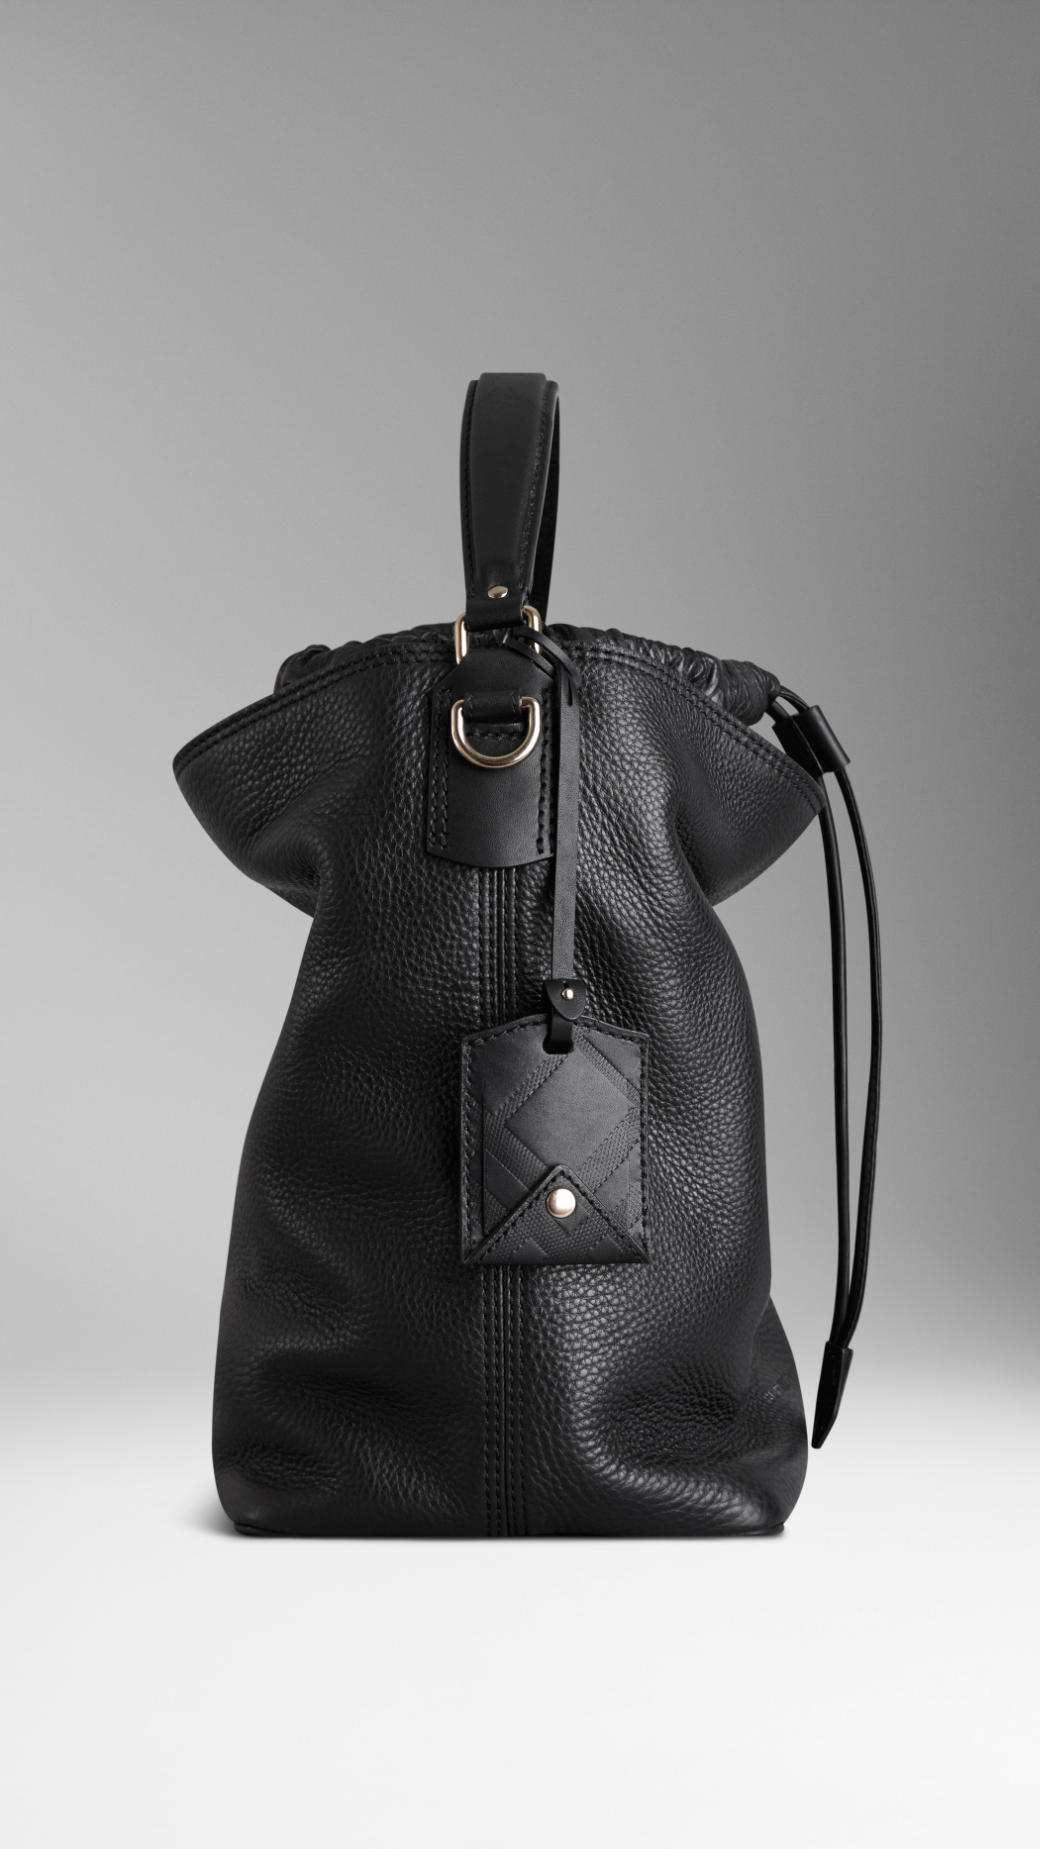 46ded4dcf1e9 Lyst - Burberry The Medium Ashby Leather Hobo in Black